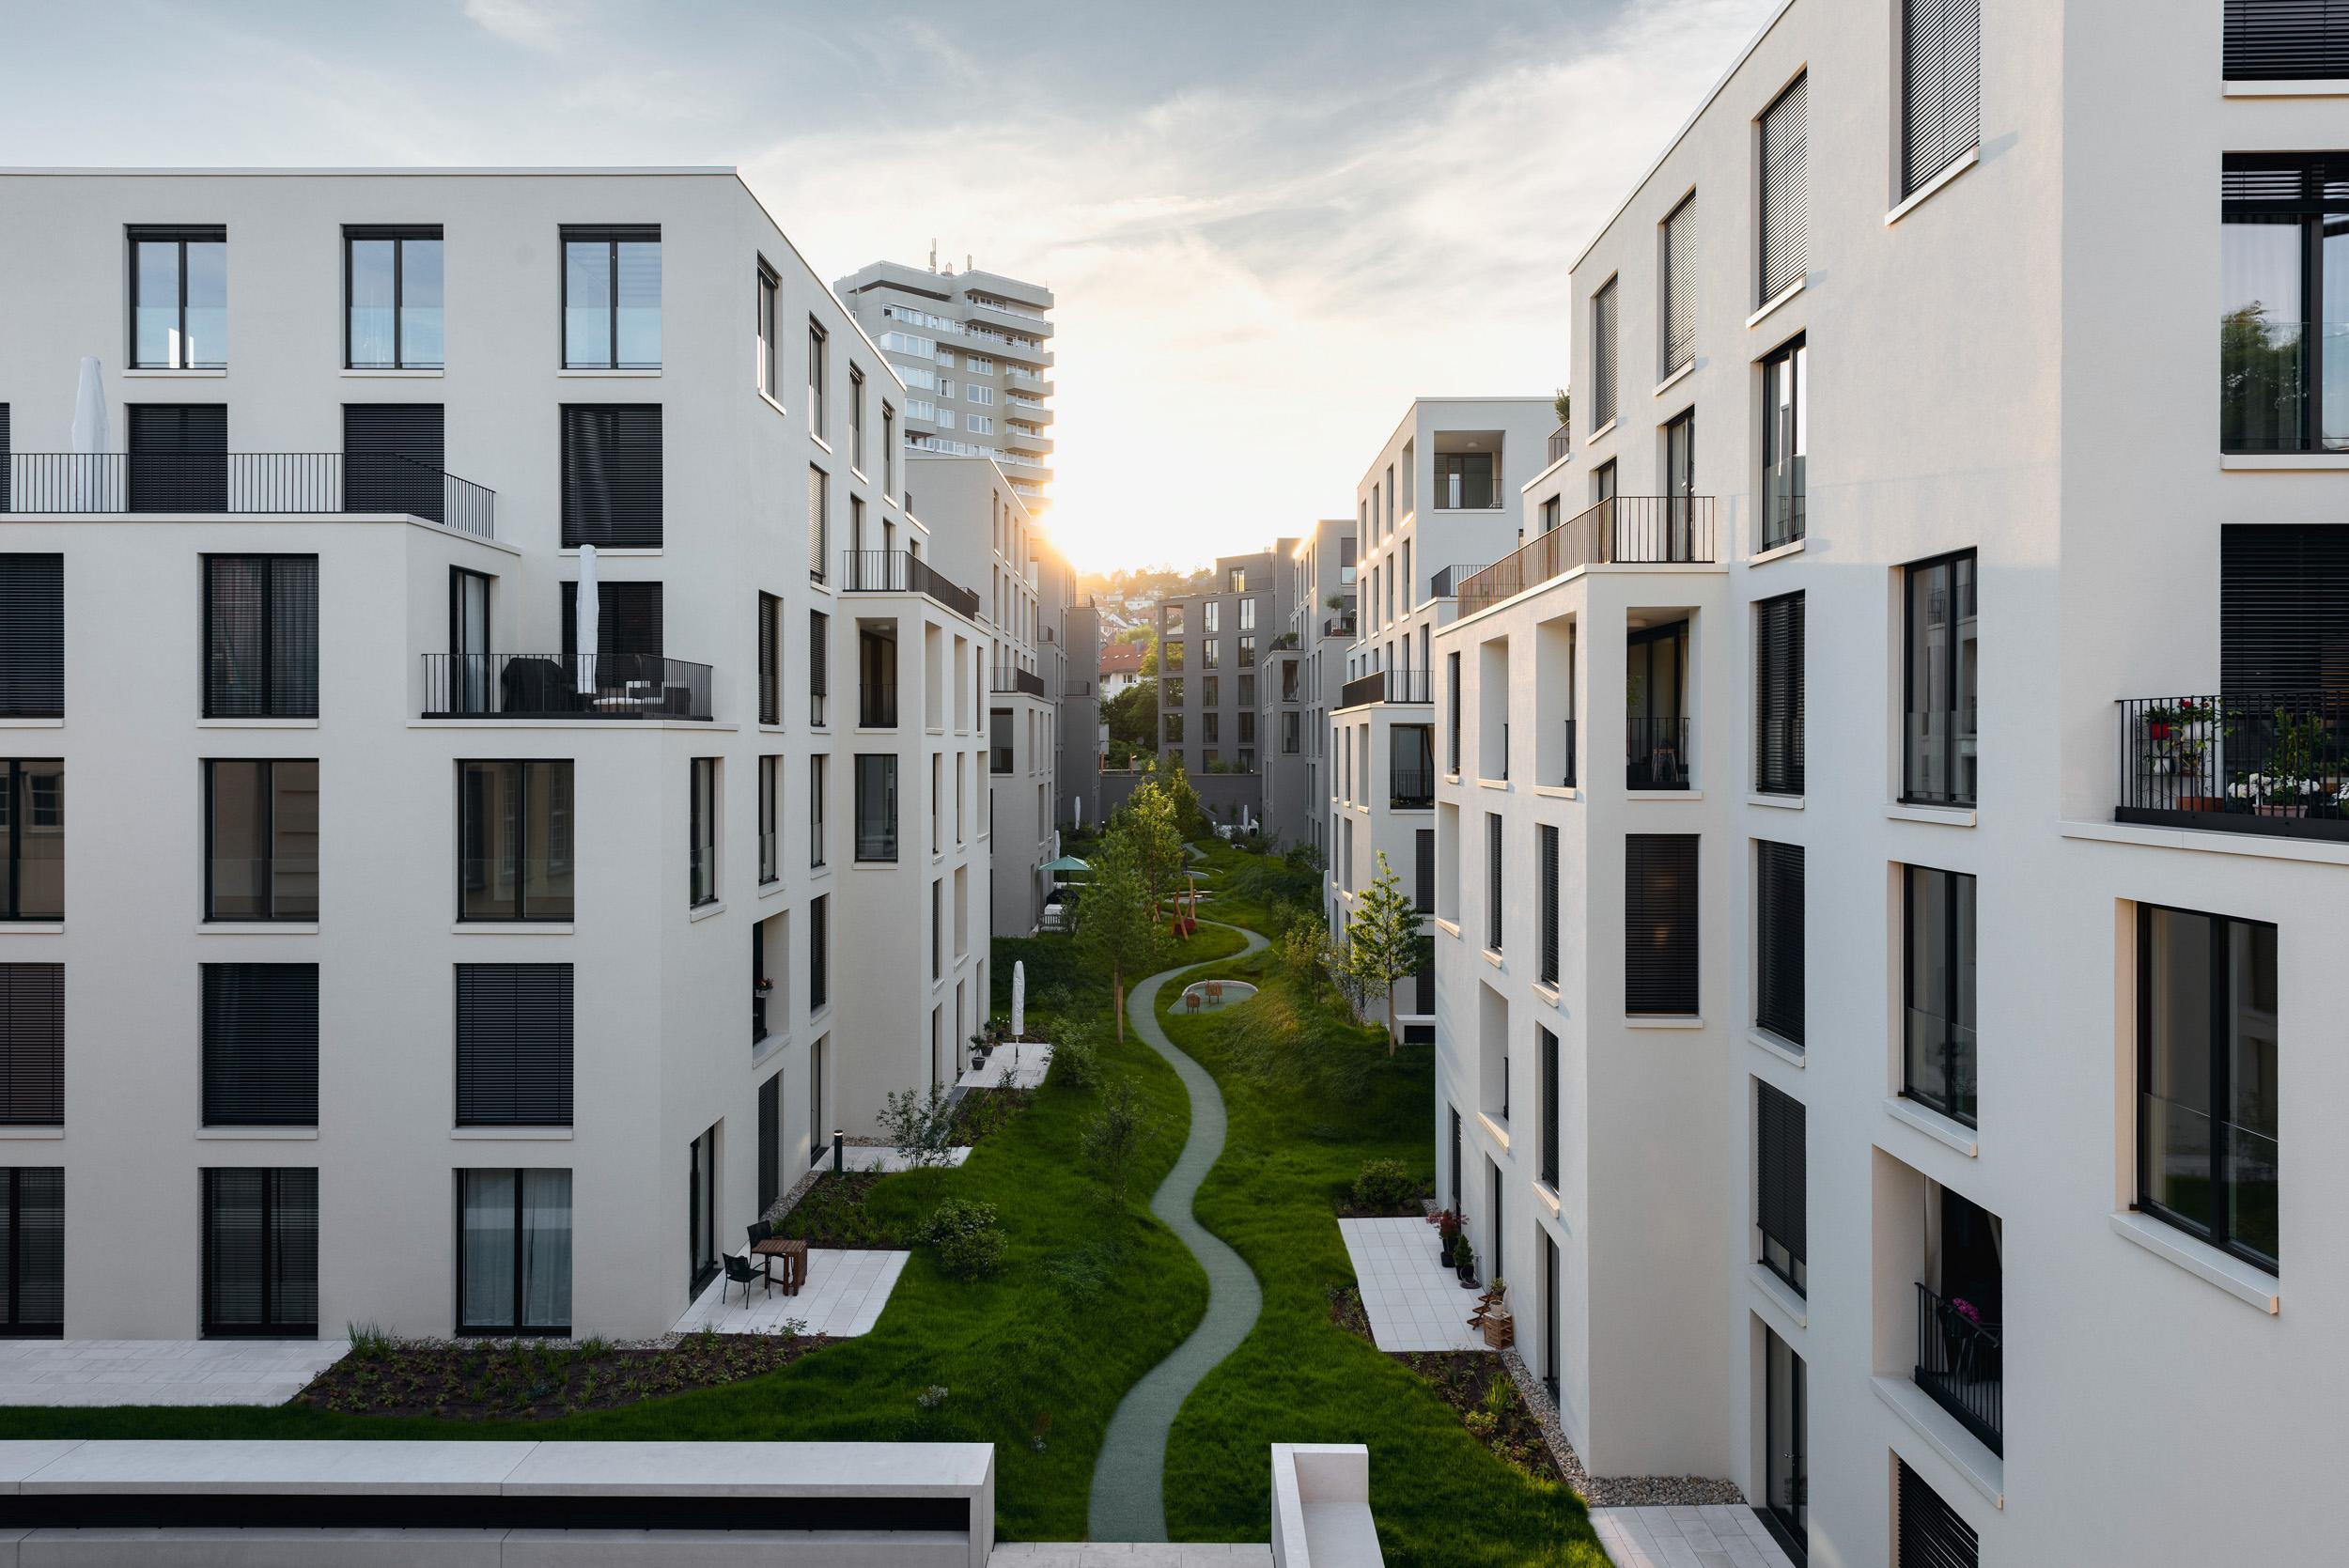 Gustav-Epple-Bauunternehmung-Stuttgart-Villengarten-MLX3335